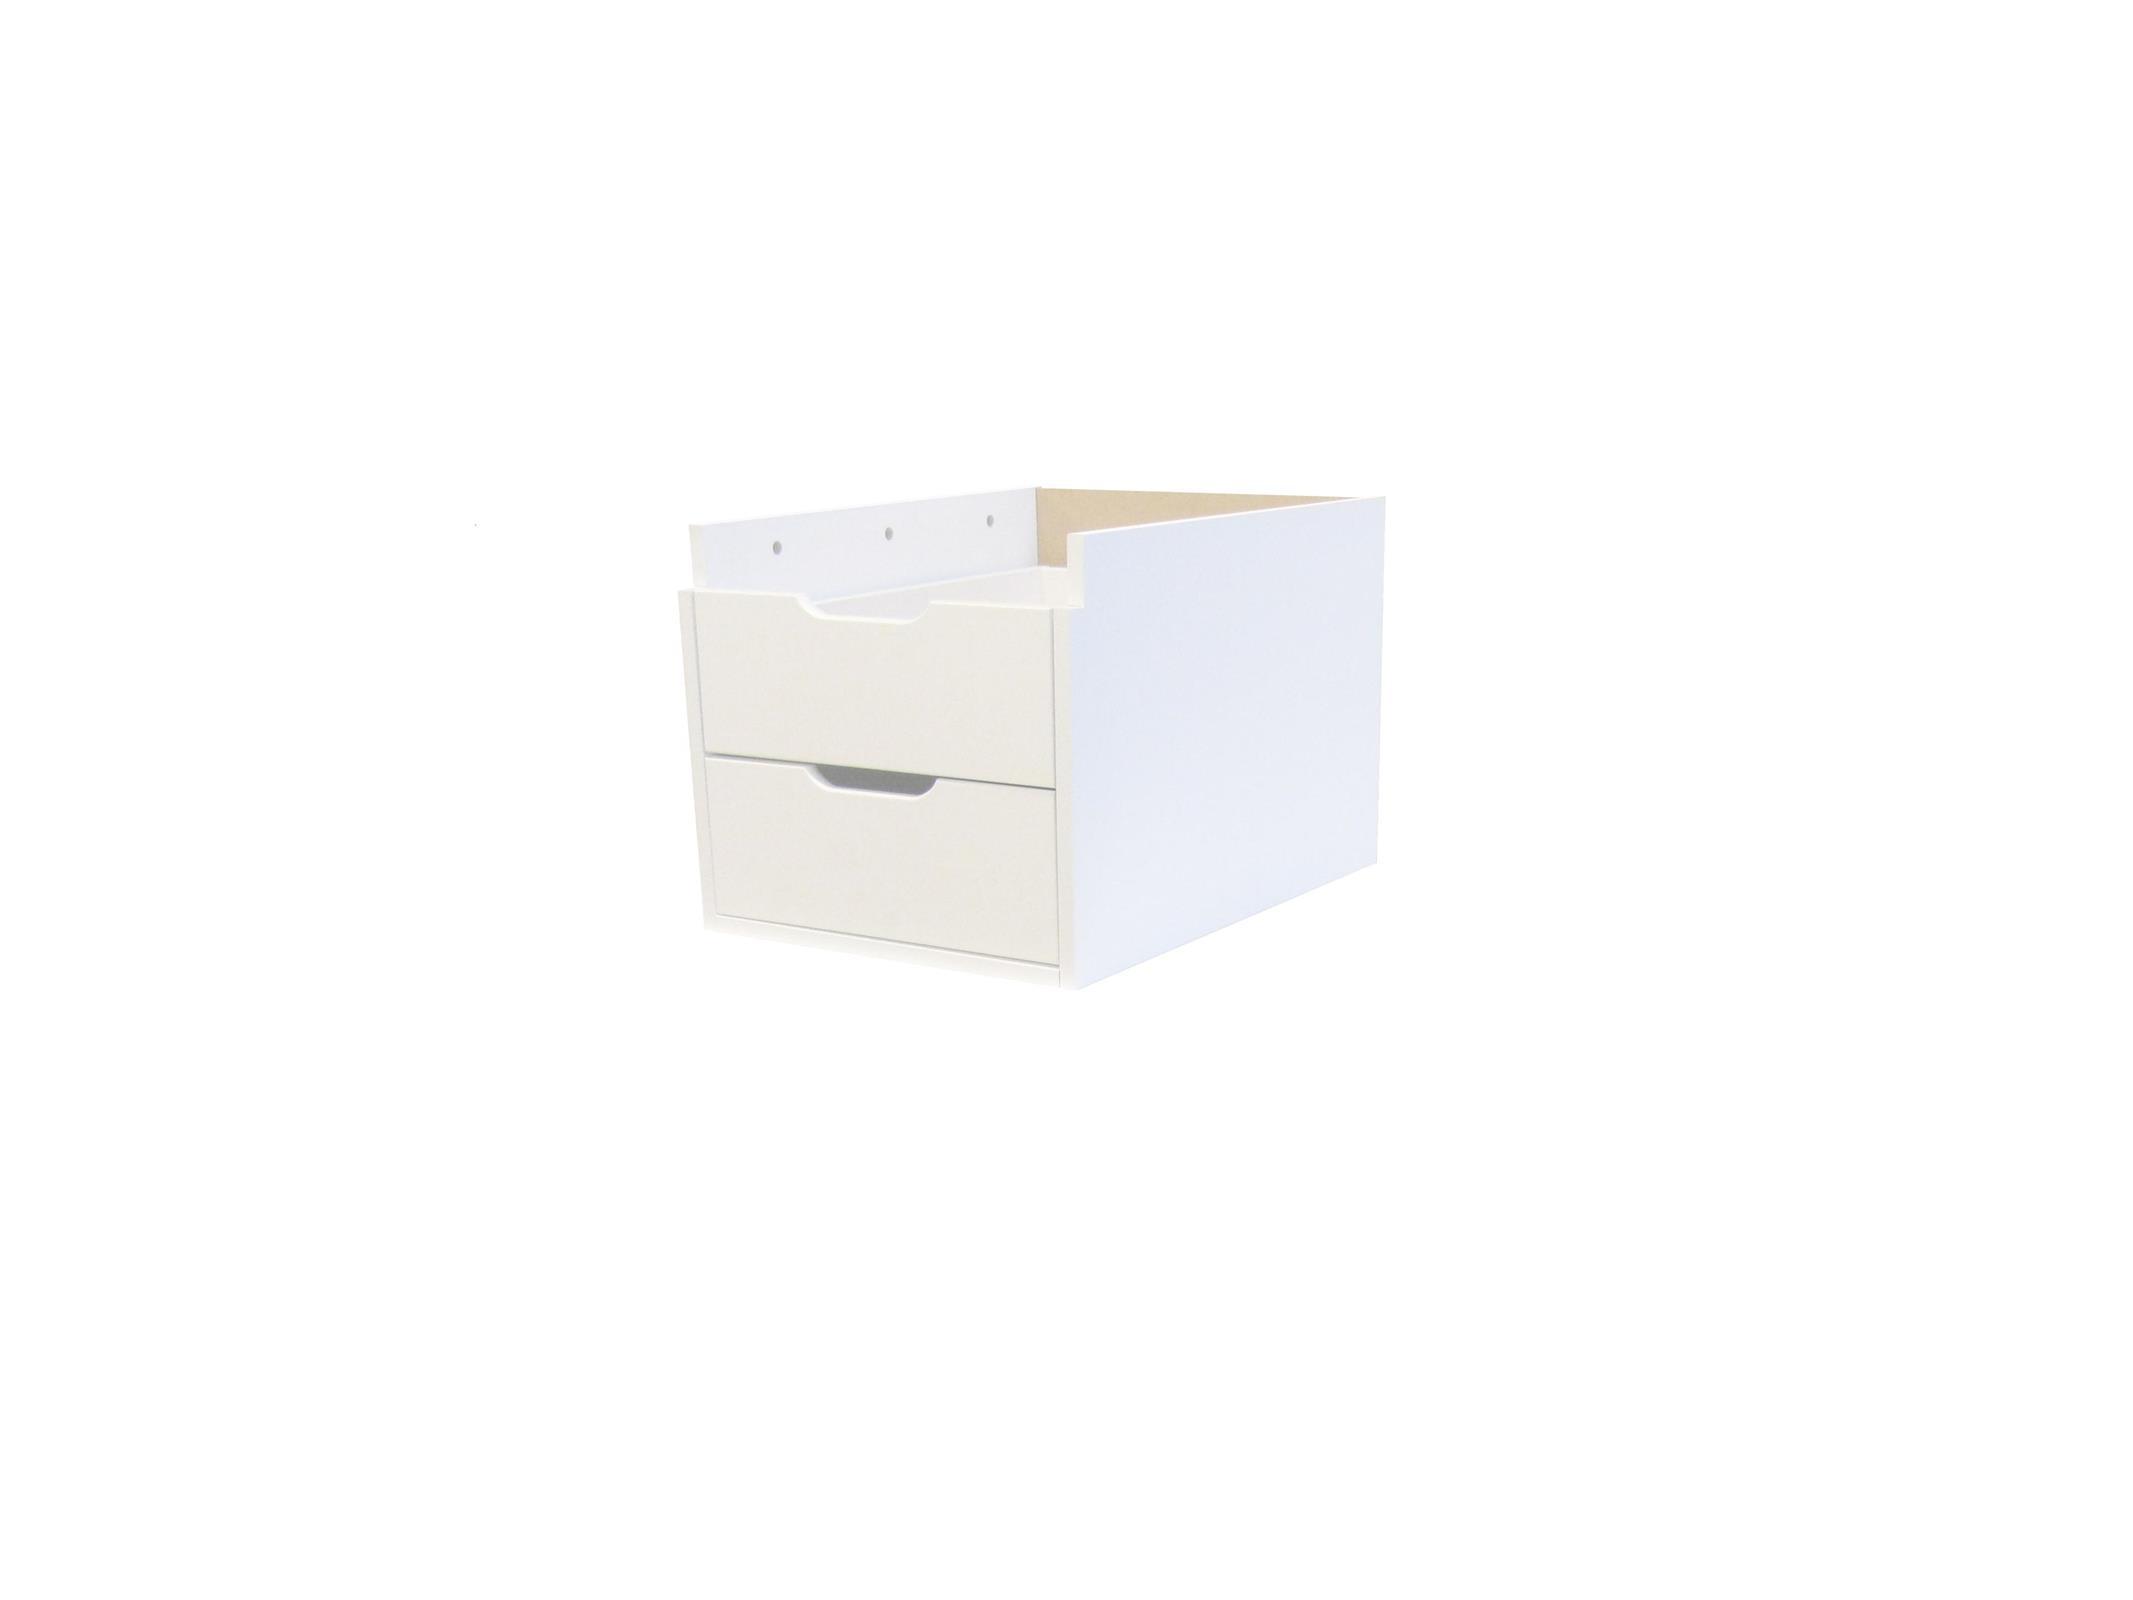 Hoppekids – Hoppekids maja skuffesektion m. 2 skuffer - hvid, 1 stk. på lager fra pixizoo